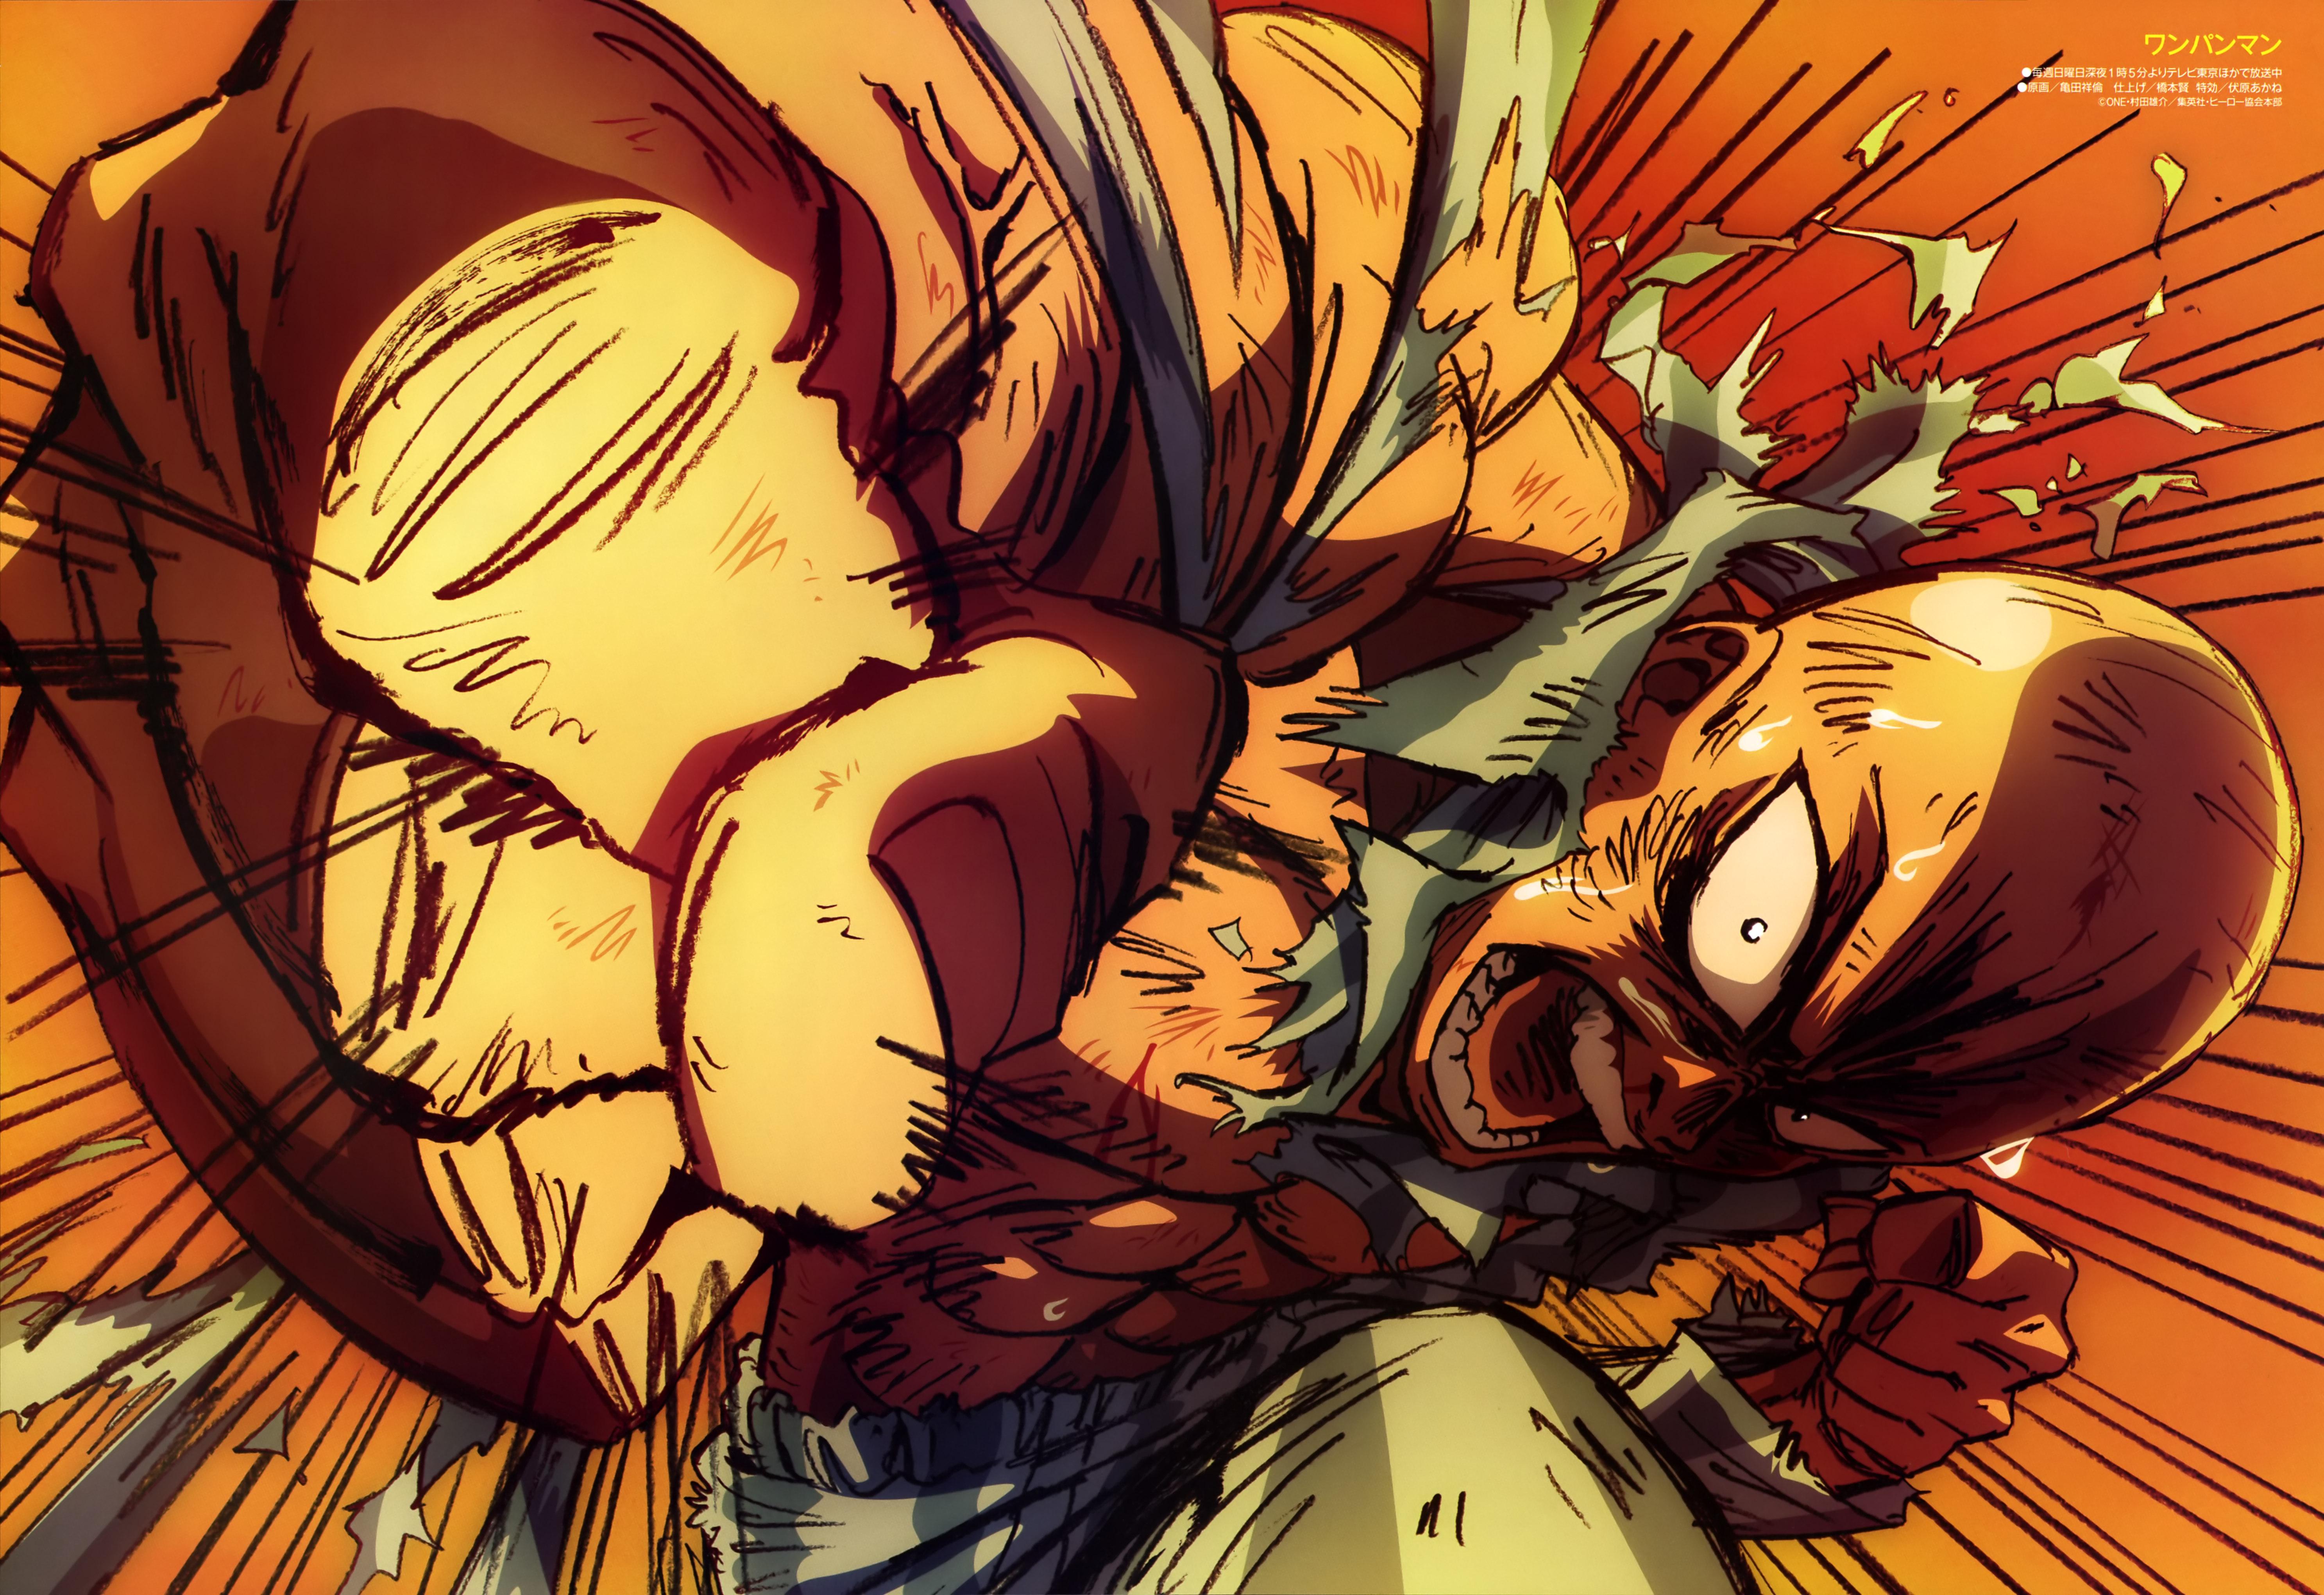 Saitama - Saitama (One Punch Man) Photo (39421271) - Fanpop